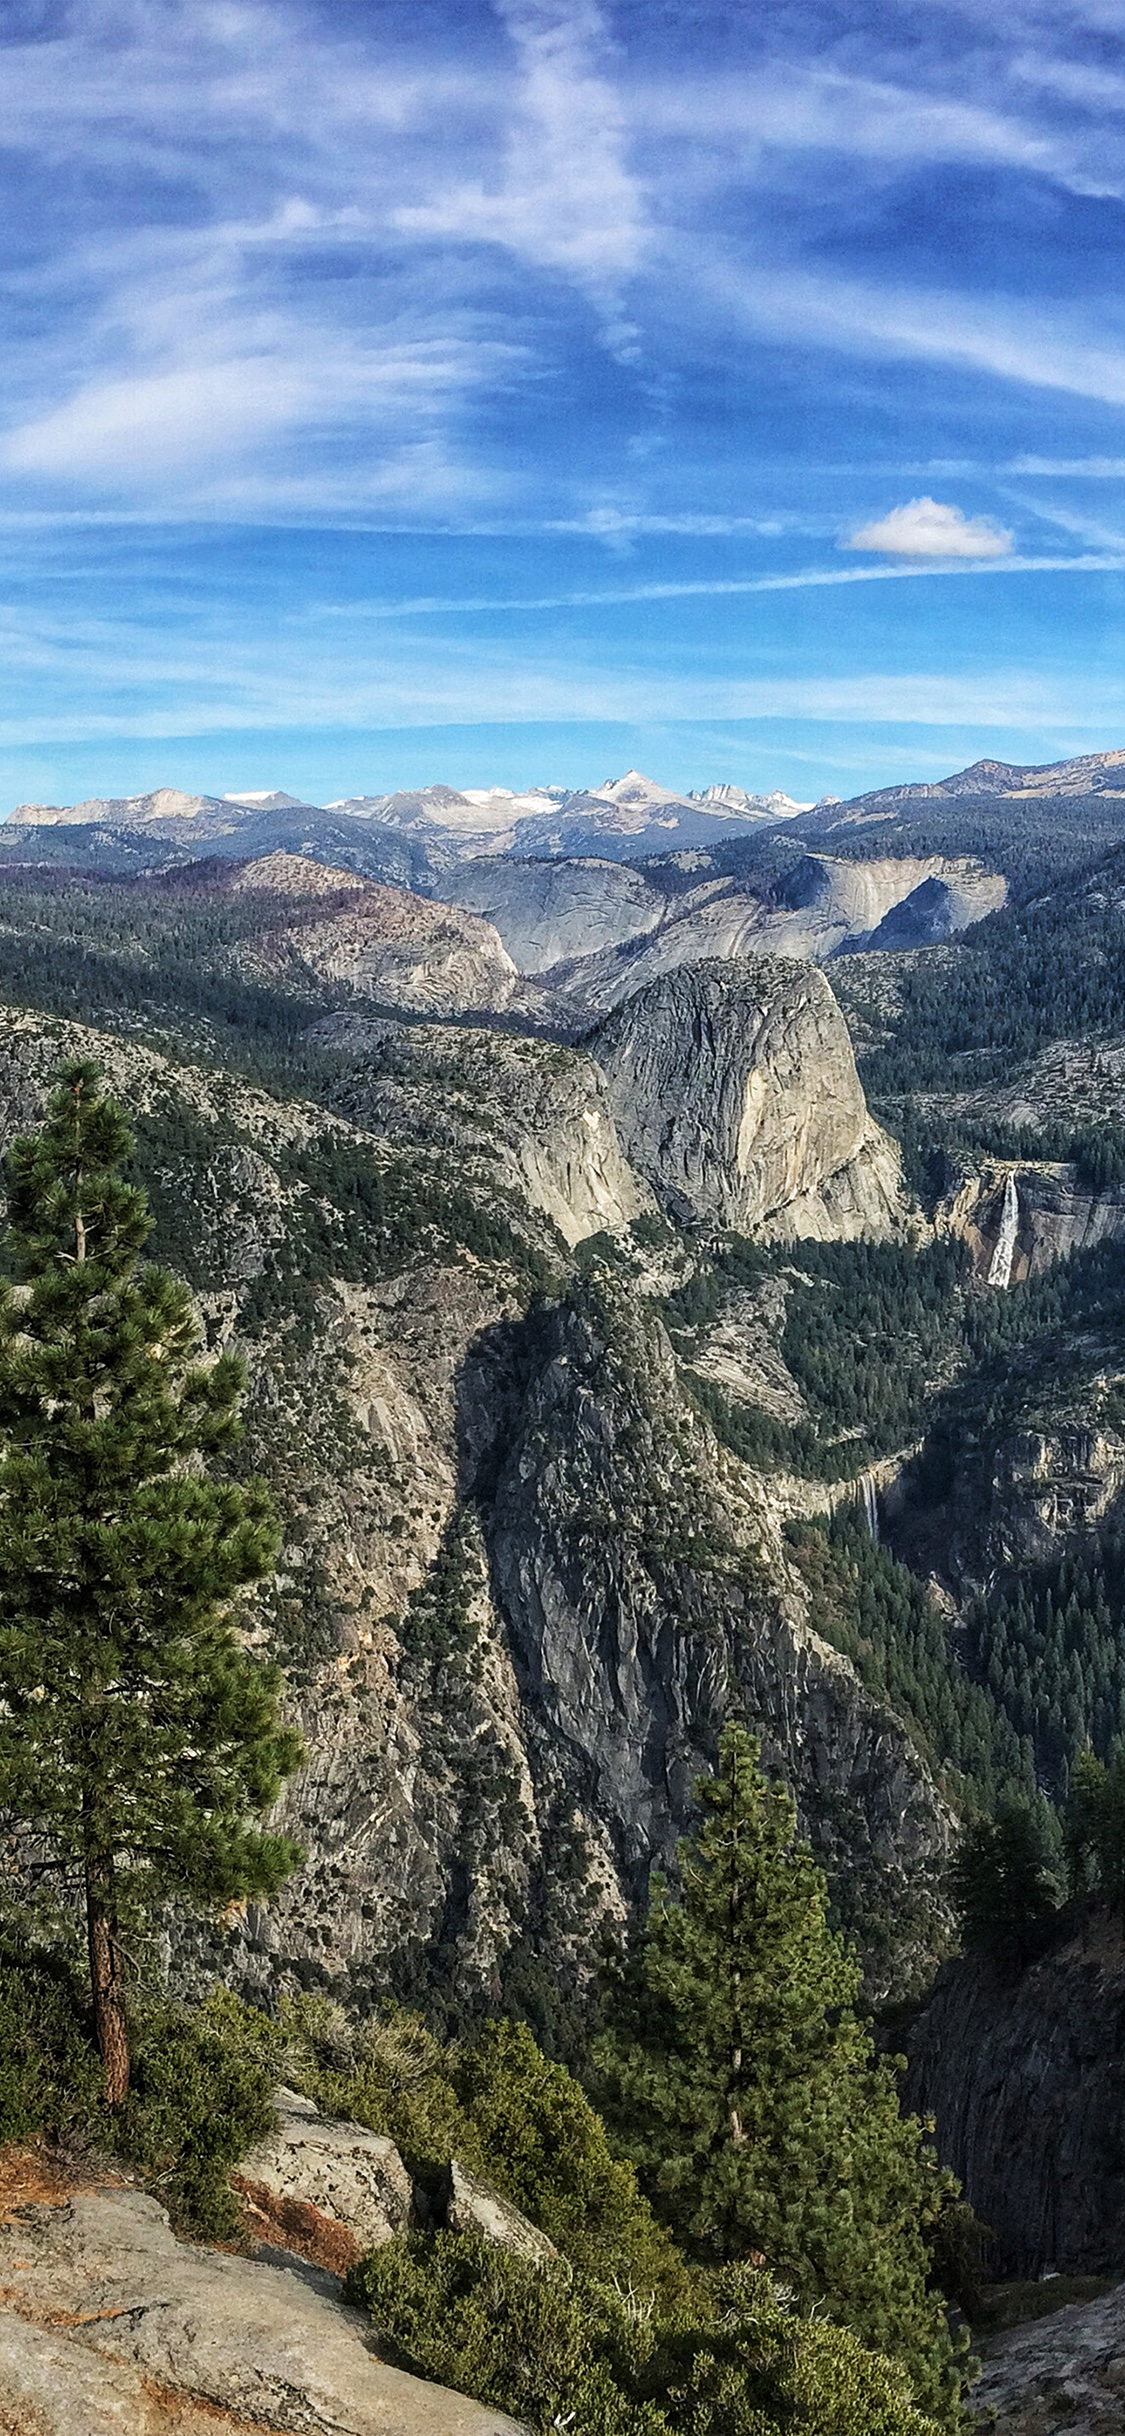 Iphonexpapers Com Iphone X Wallpaper Ng61 Summer Mountain Yosemite Nature Cloud Sky